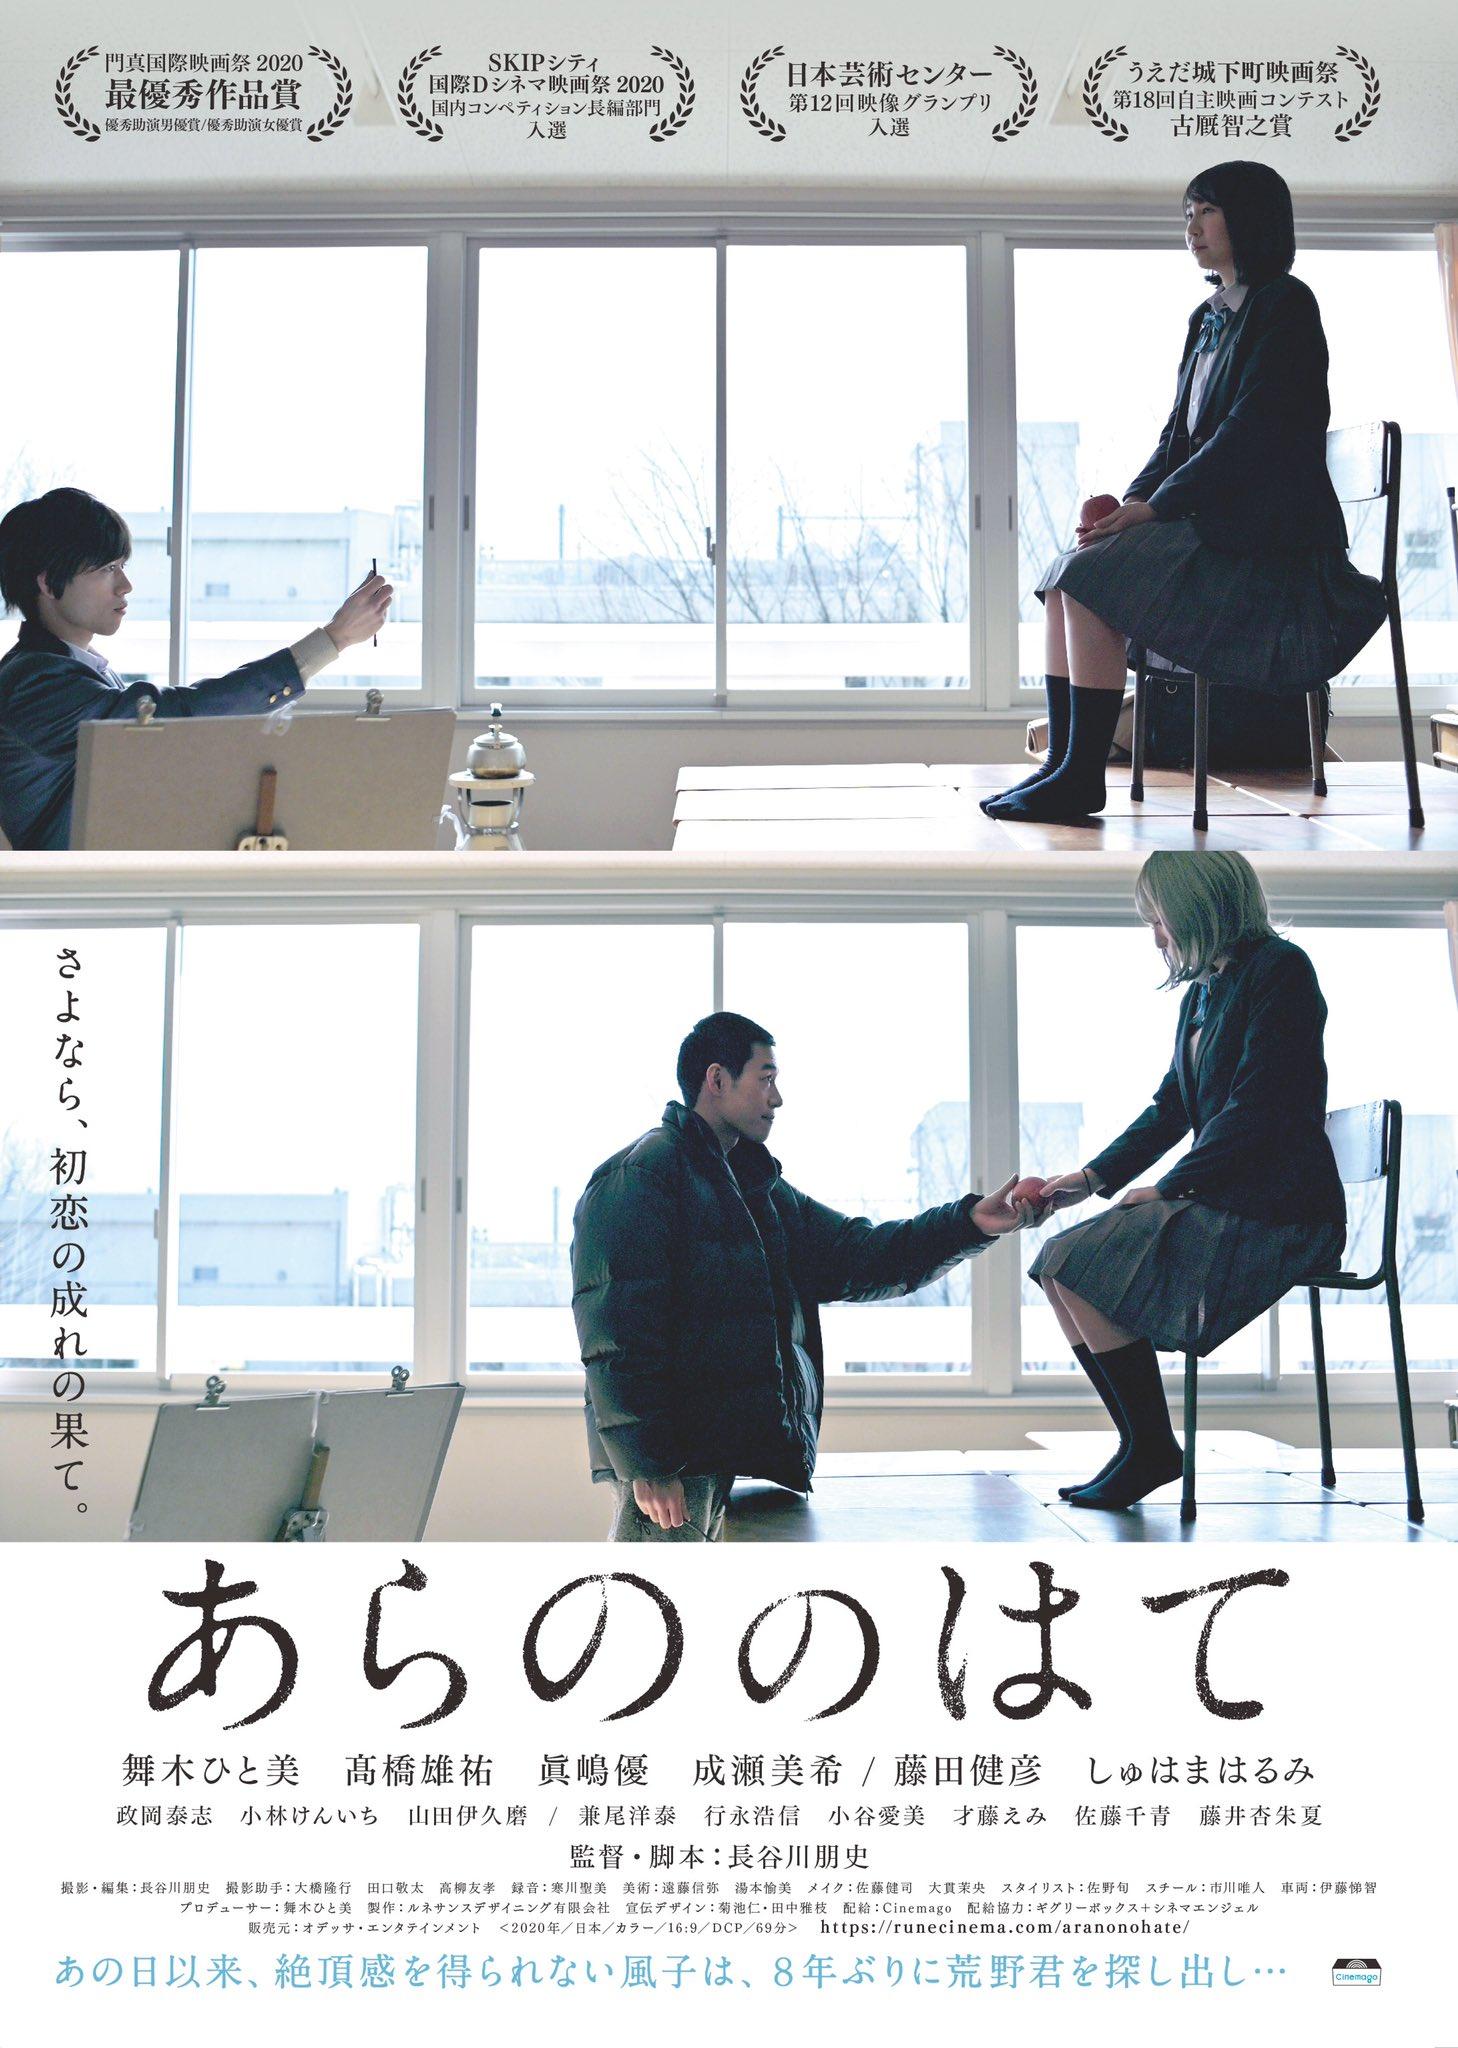 Arano film - Tomofumi Hasegawa - poster